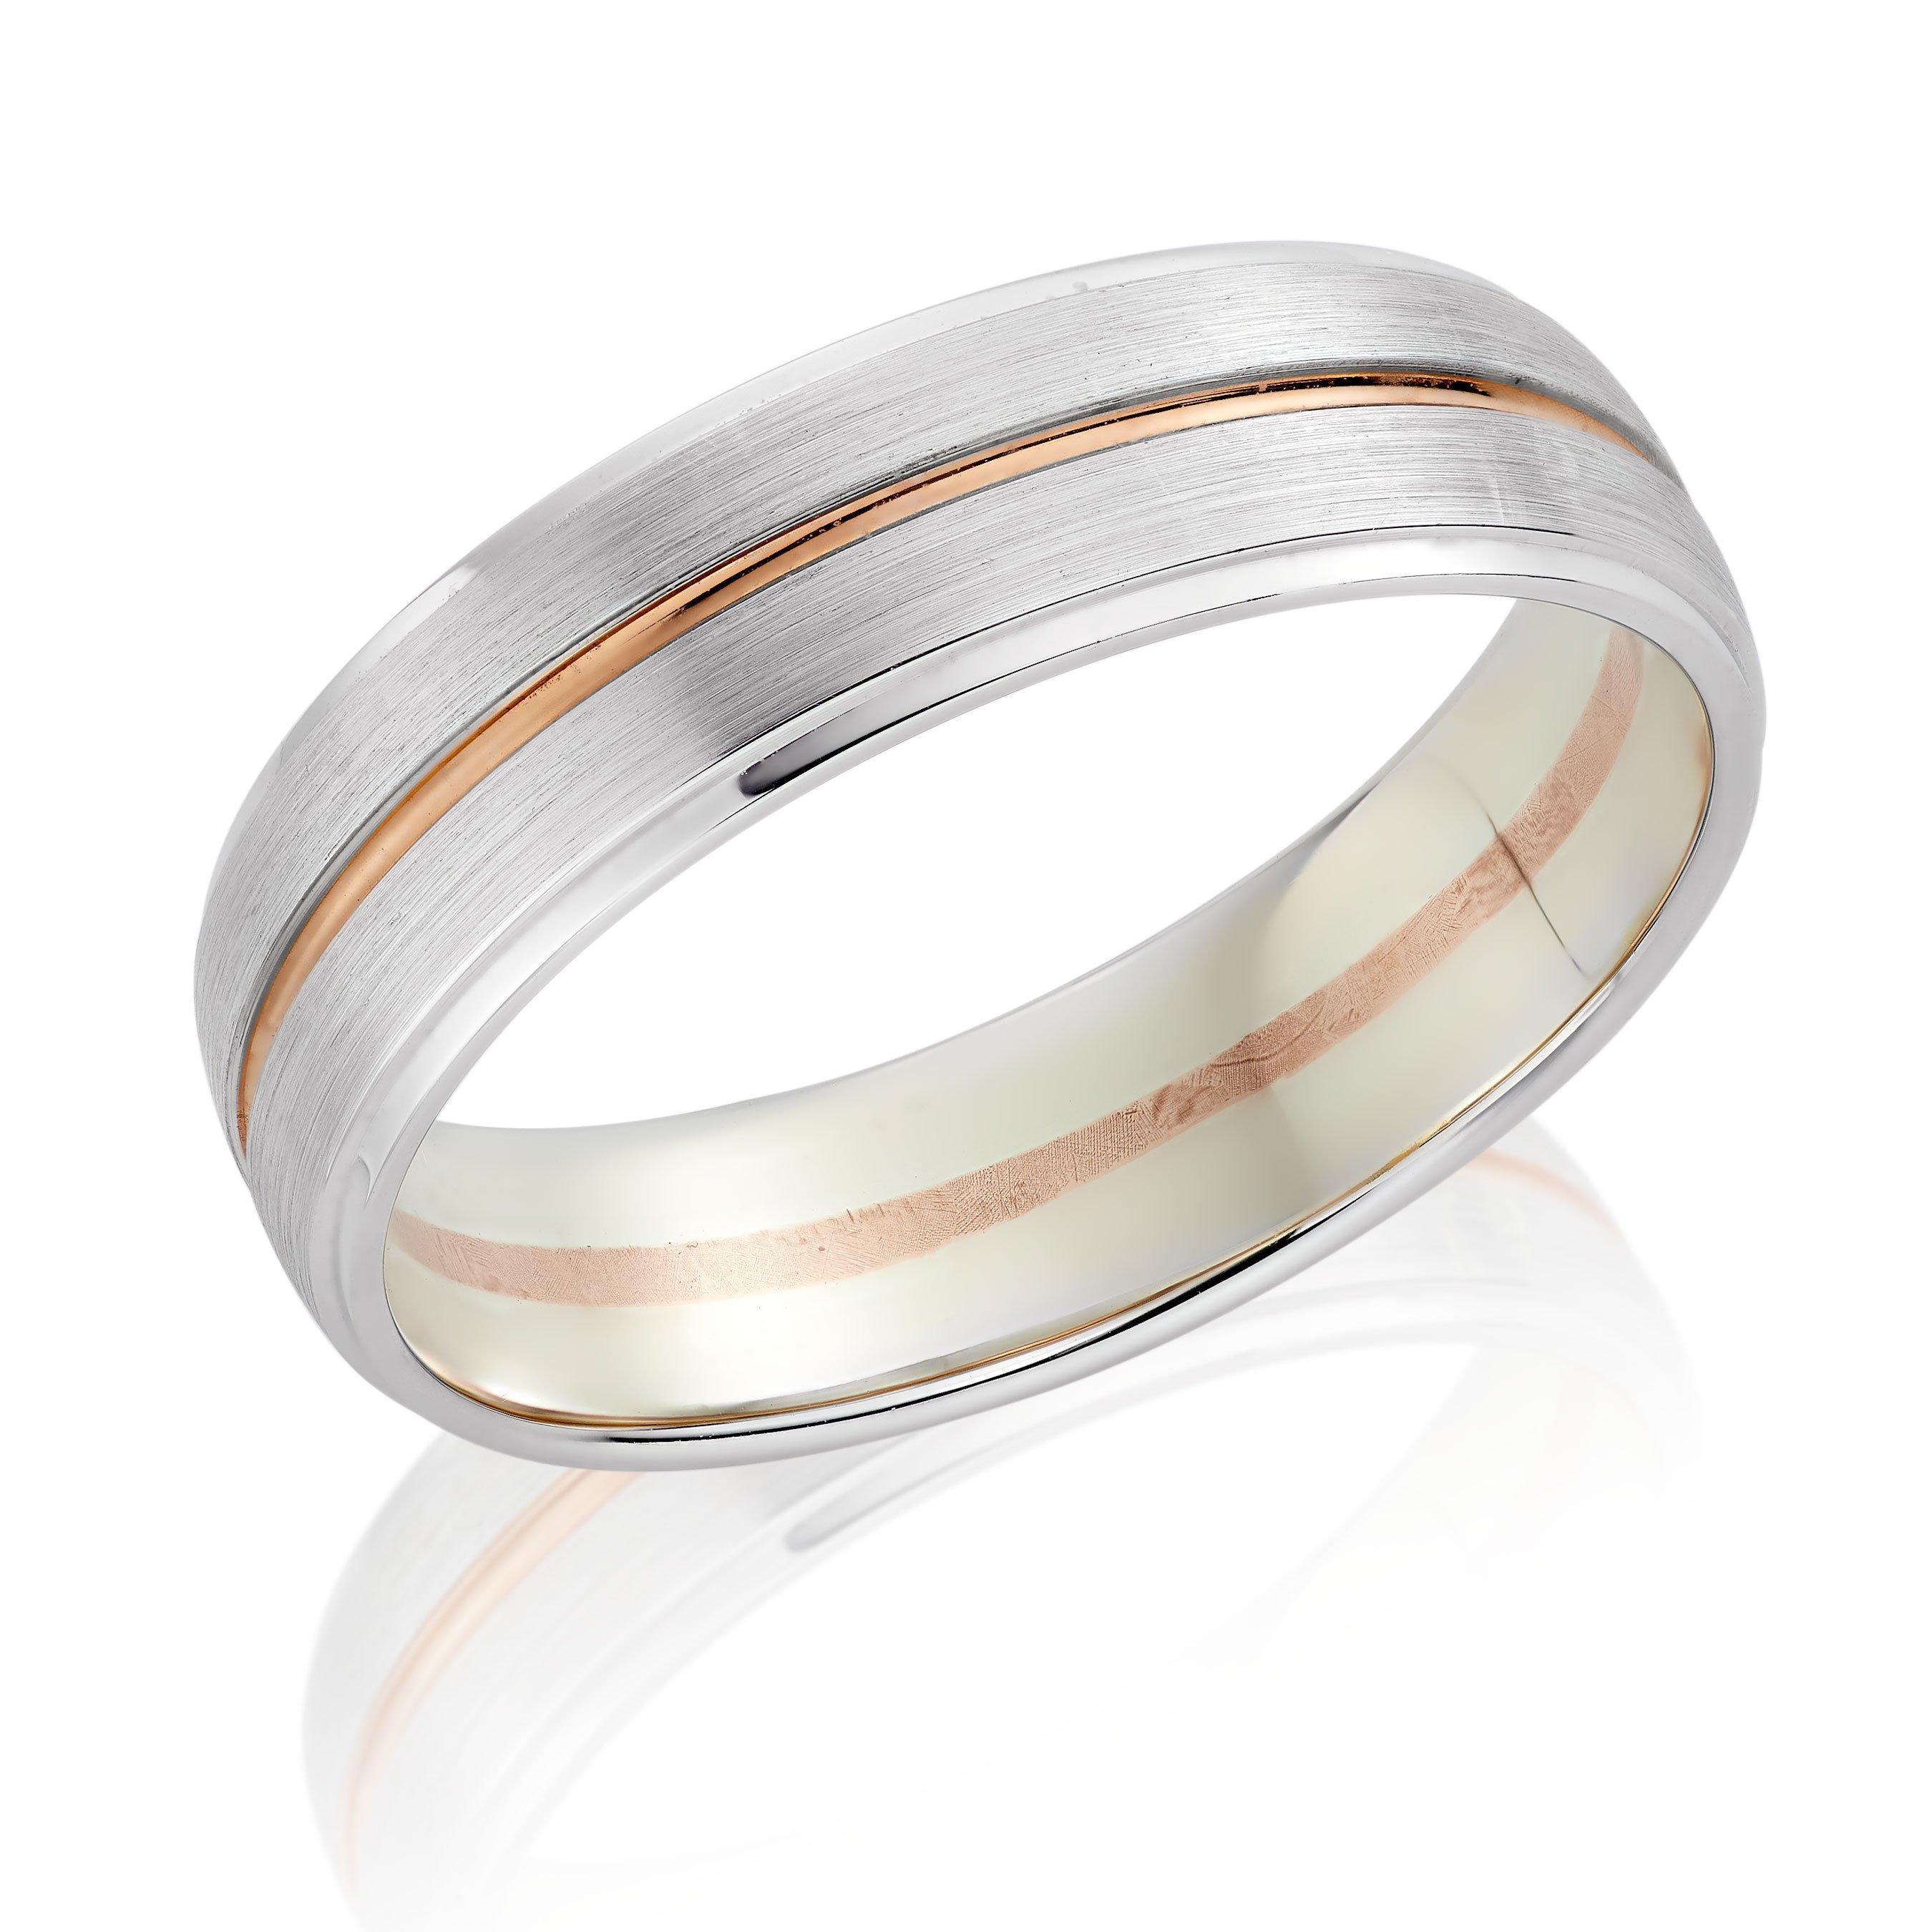 9ct White Gold and Rose Gold Men's Wedding Ring